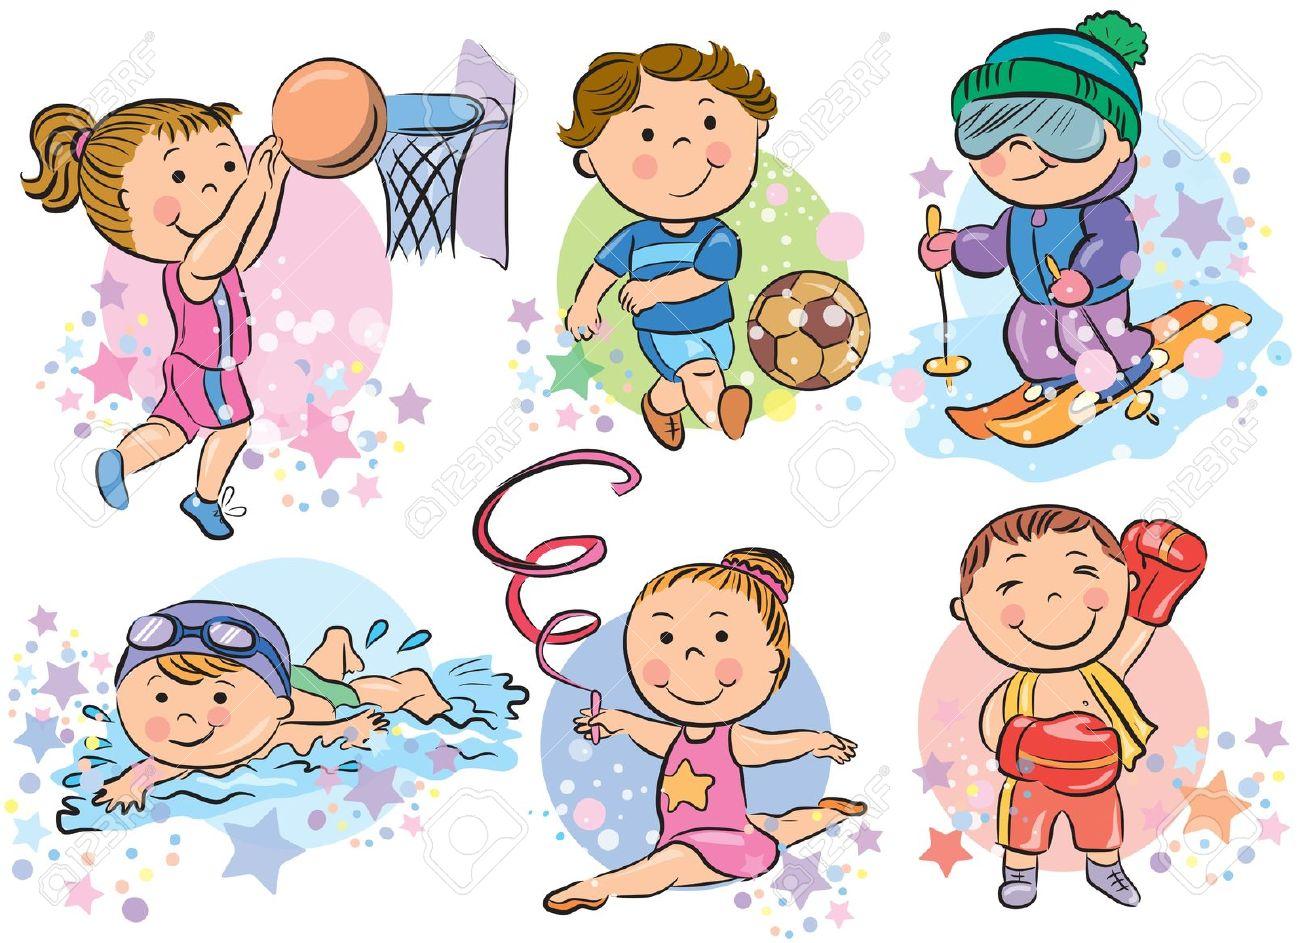 Kids sports clip art